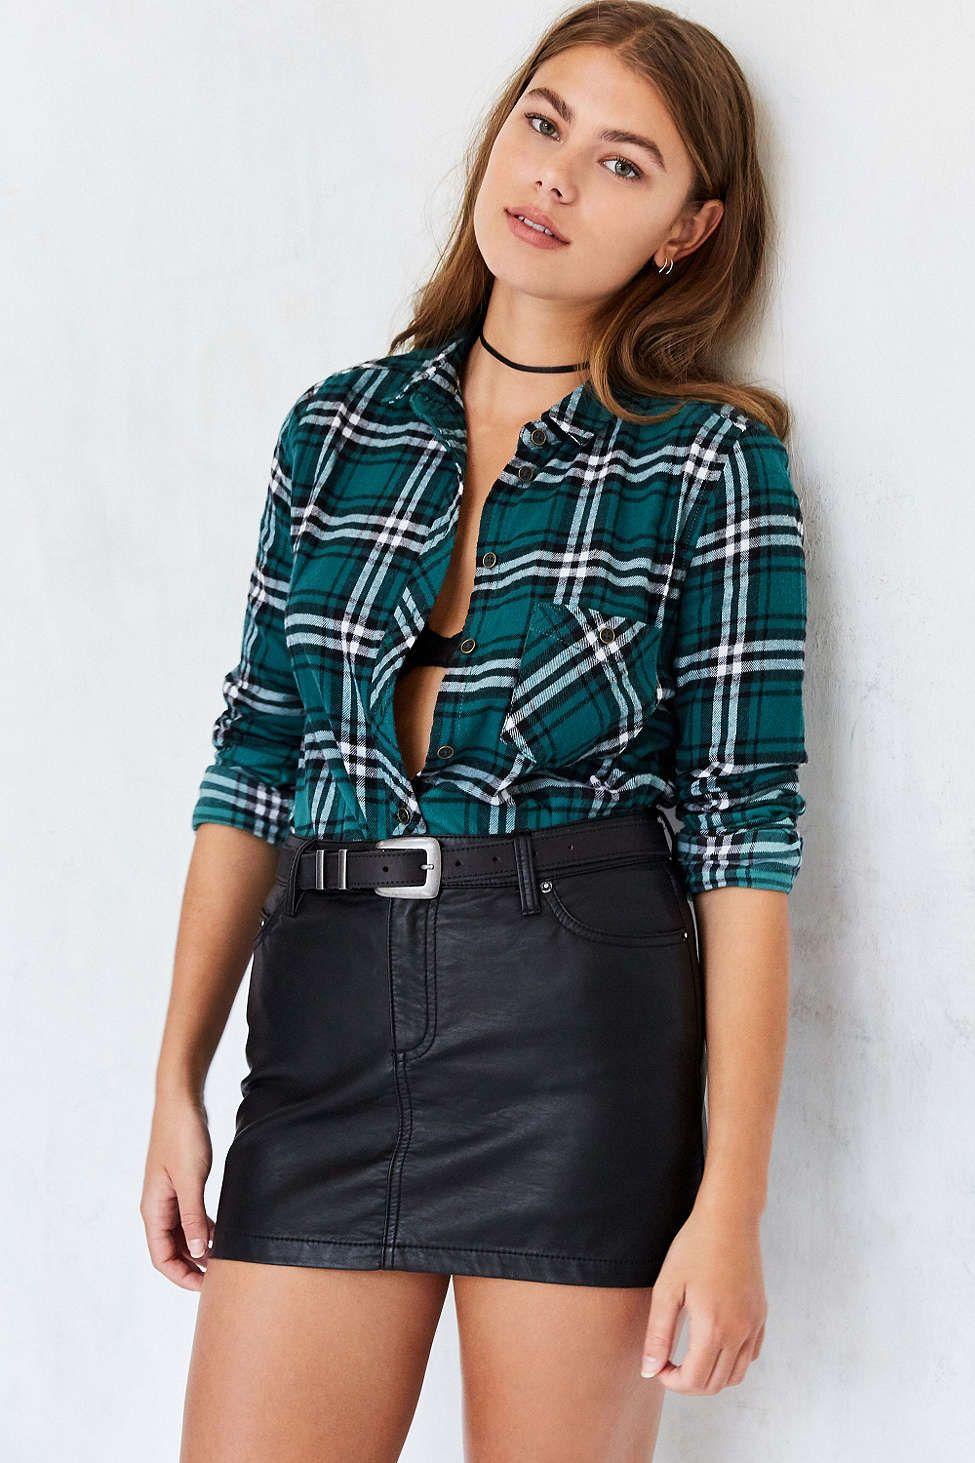 Flannel shirt with shorts   BDG Polly Flannel ButtonDown Shirt  uCLOTHESu  Pinterest